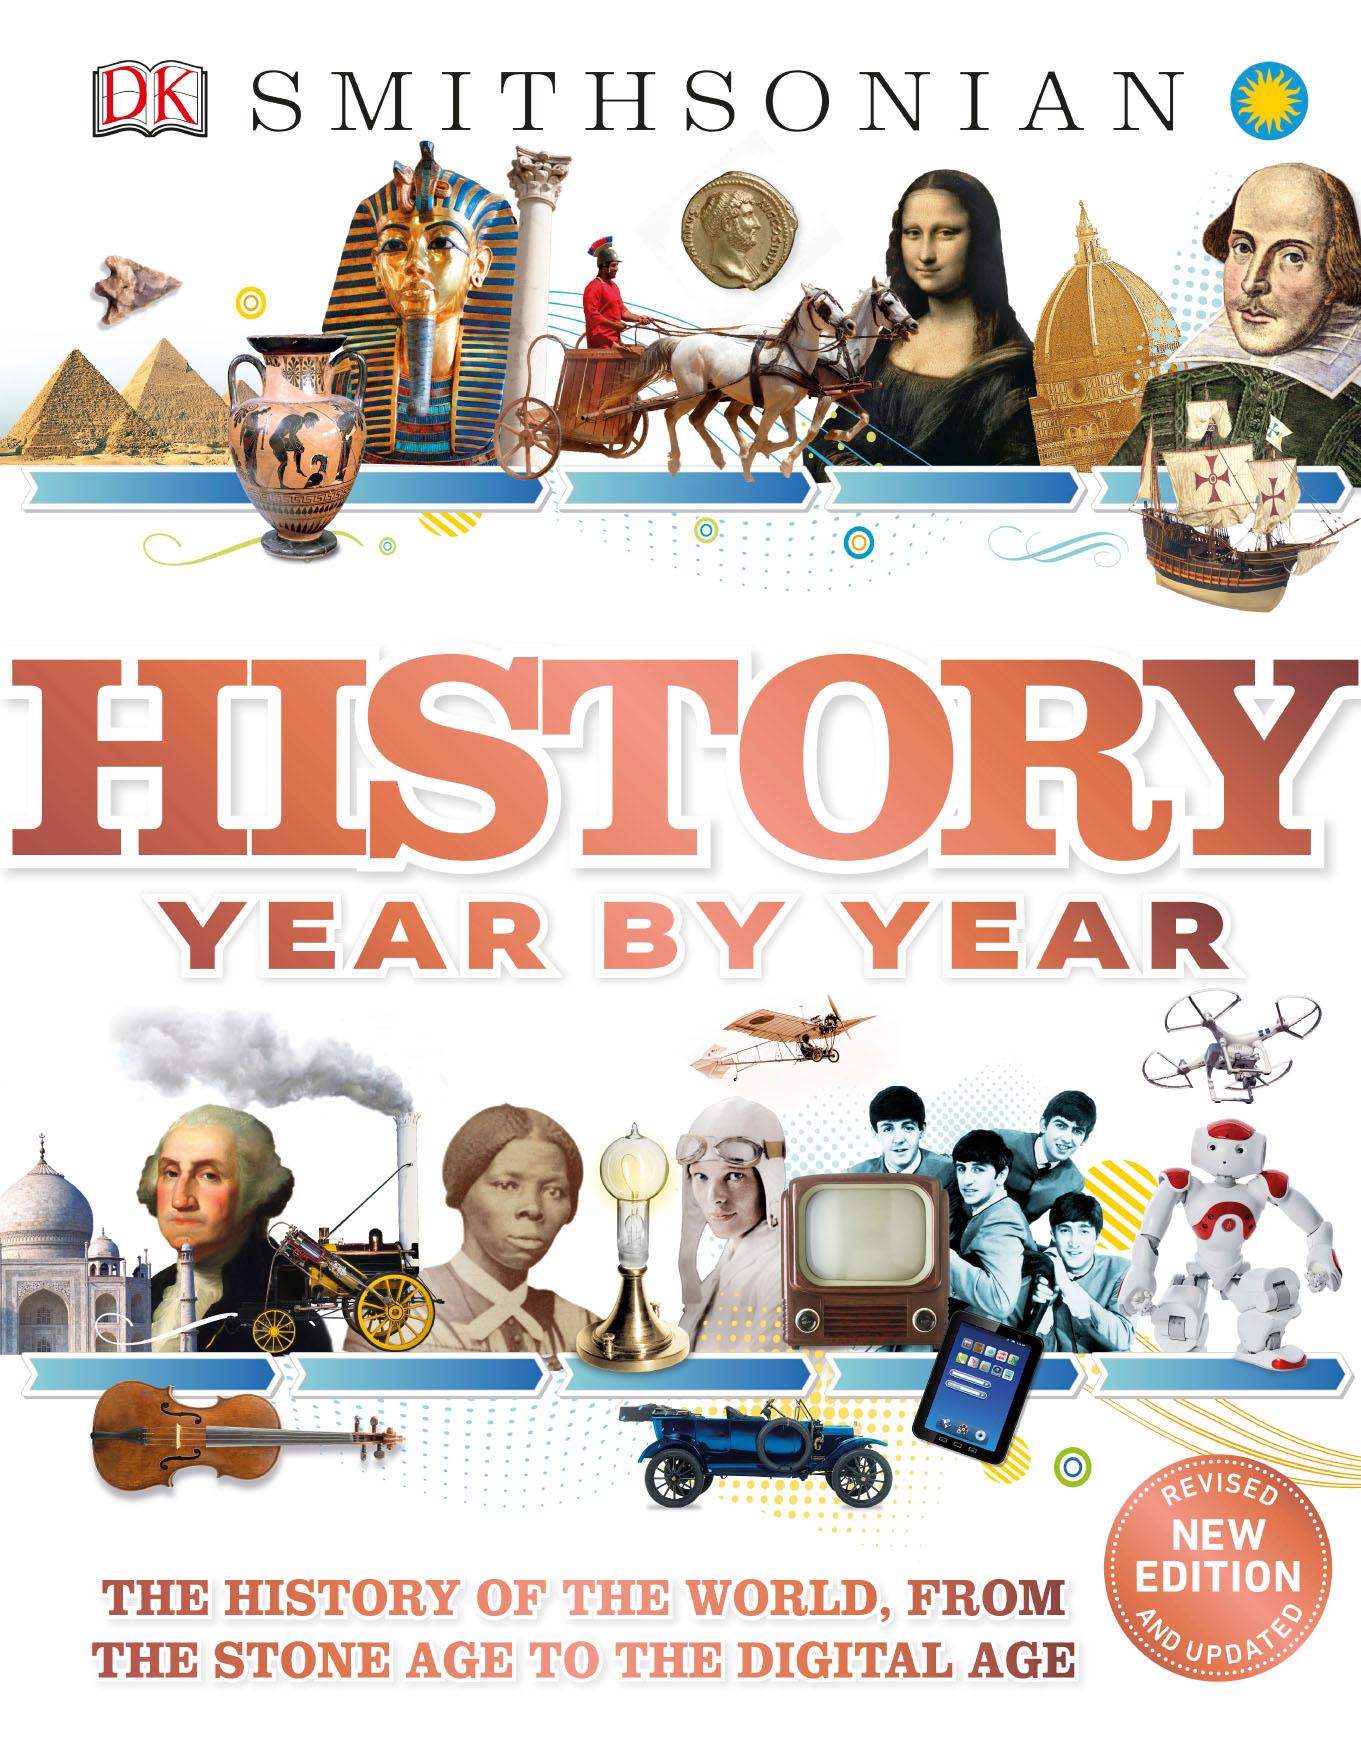 Smithsonian - History Years By Years 2019001.jpg